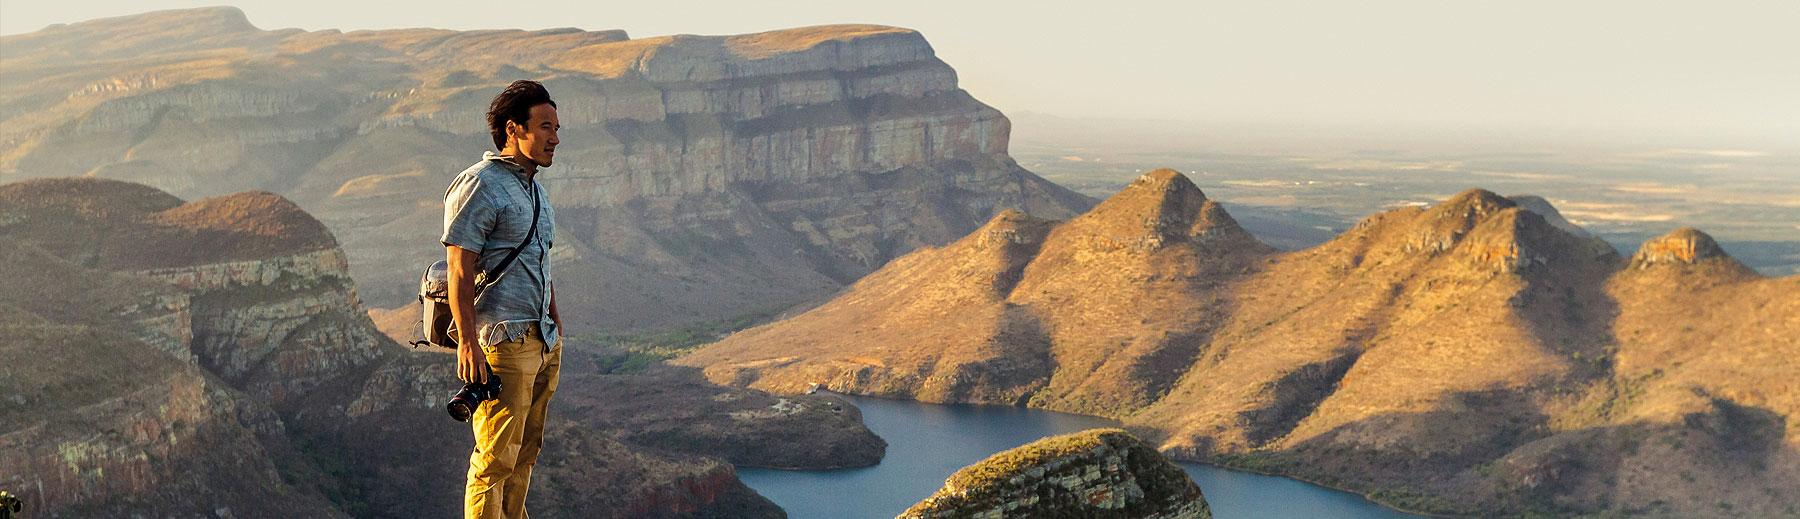 Mpumalanga Travel Guide